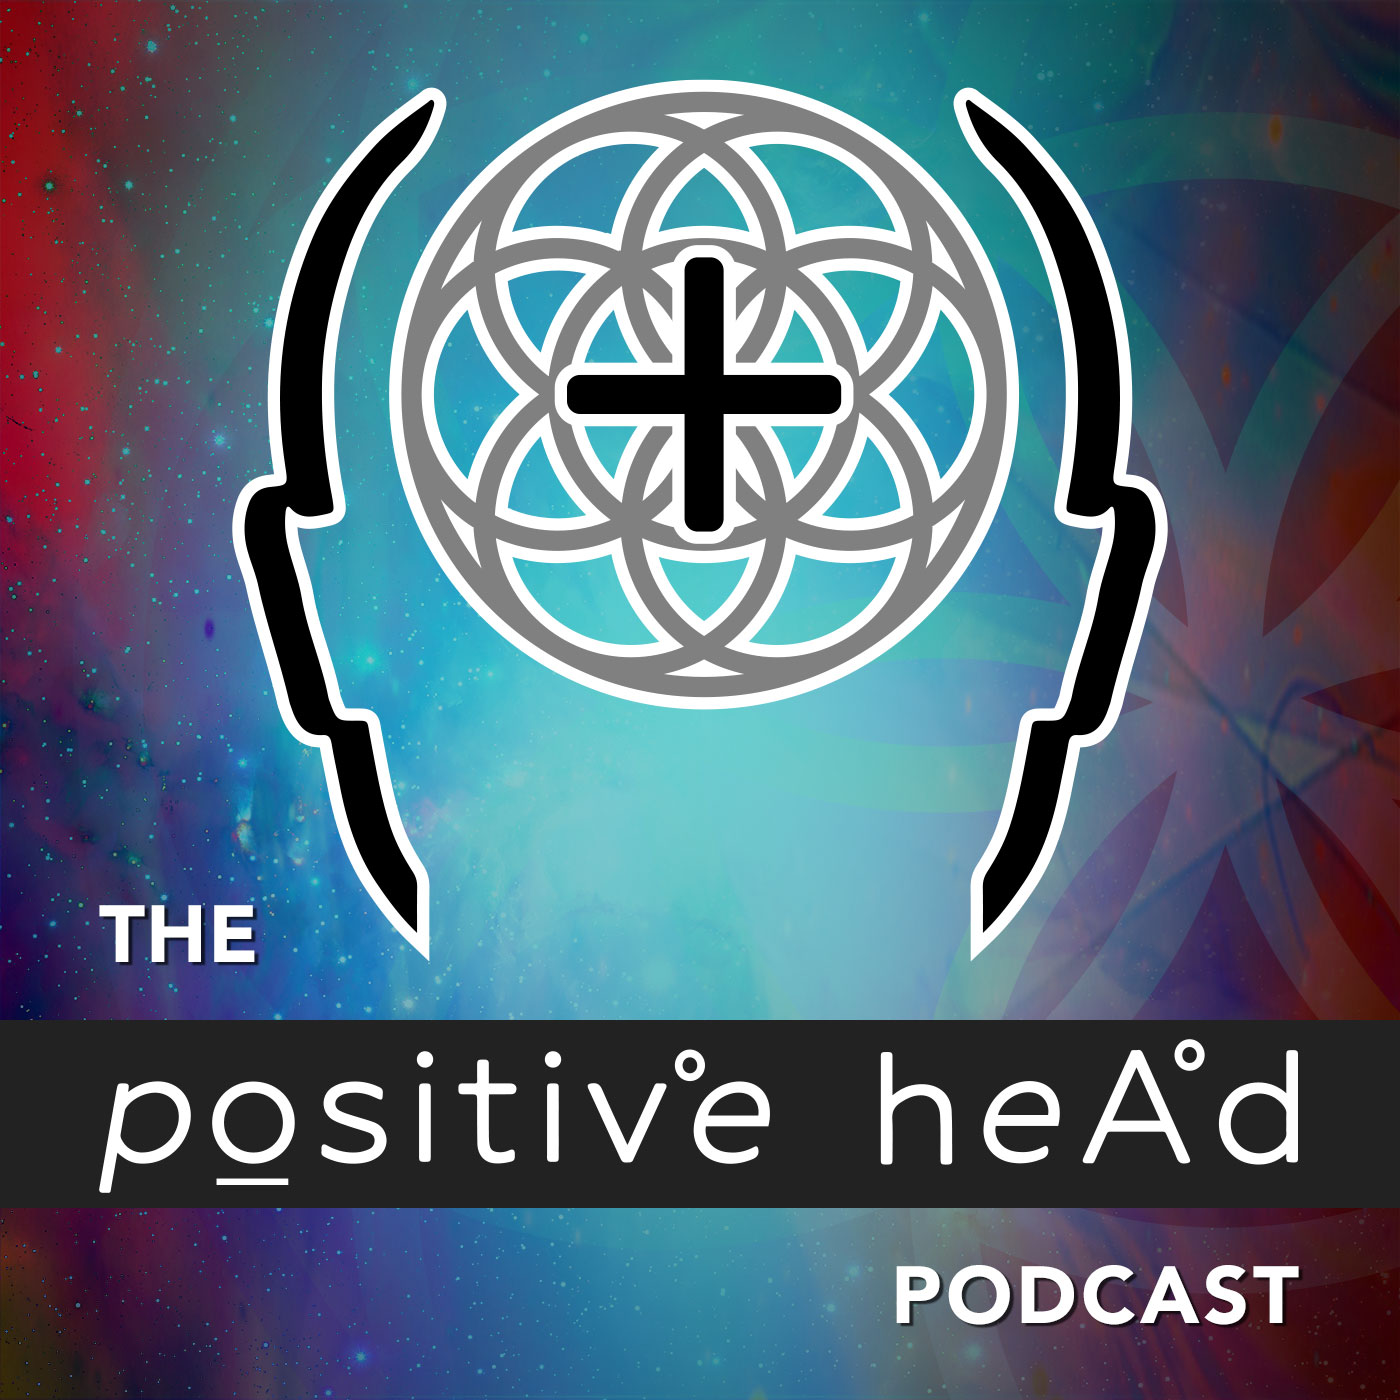 The Positive Head Podcast show art